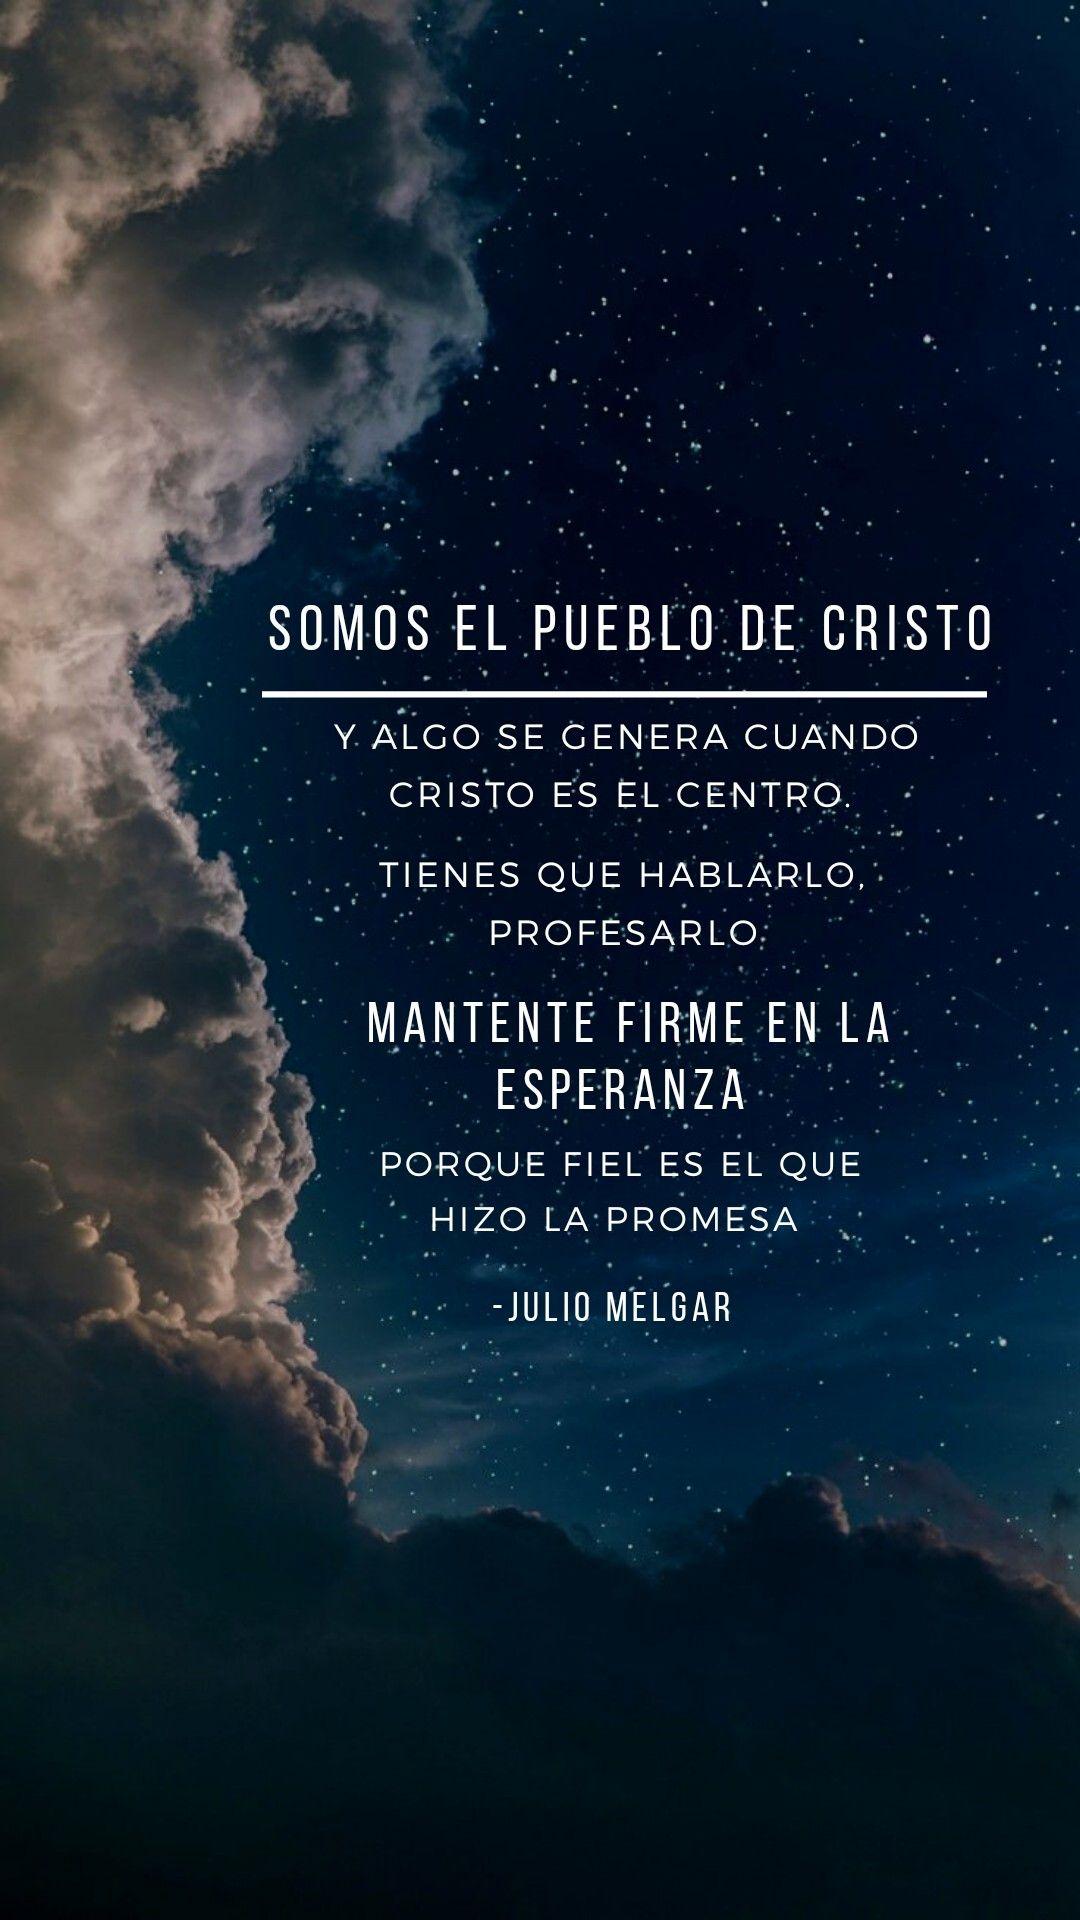 20 Ideas De Julio Melgar Julio Musica Cristiana Música Cristiana Gratis